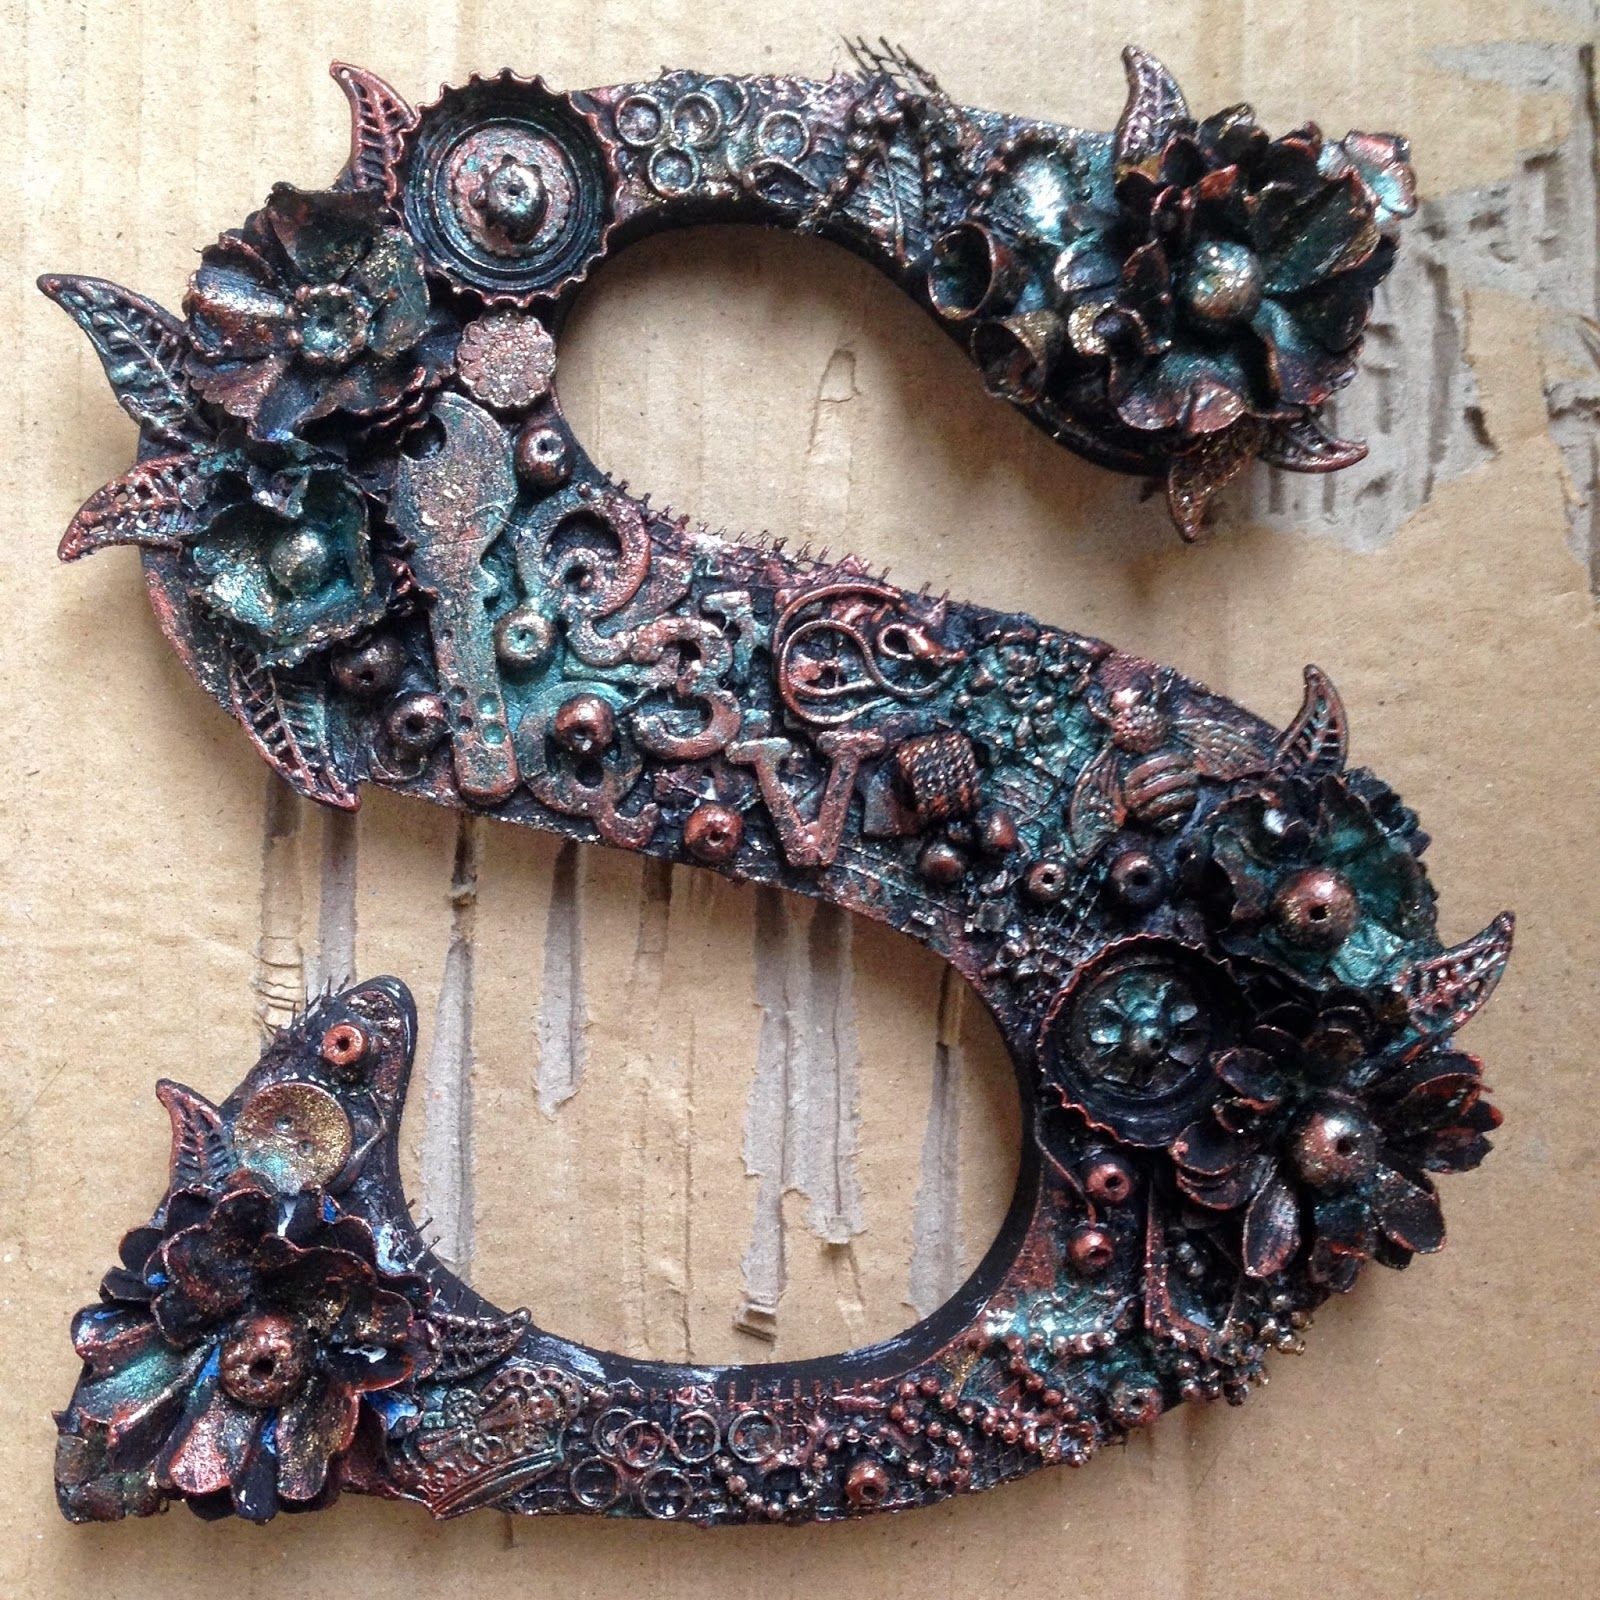 Upcycled Wooden Letter Mixed Media Mixed Media Art Mixed